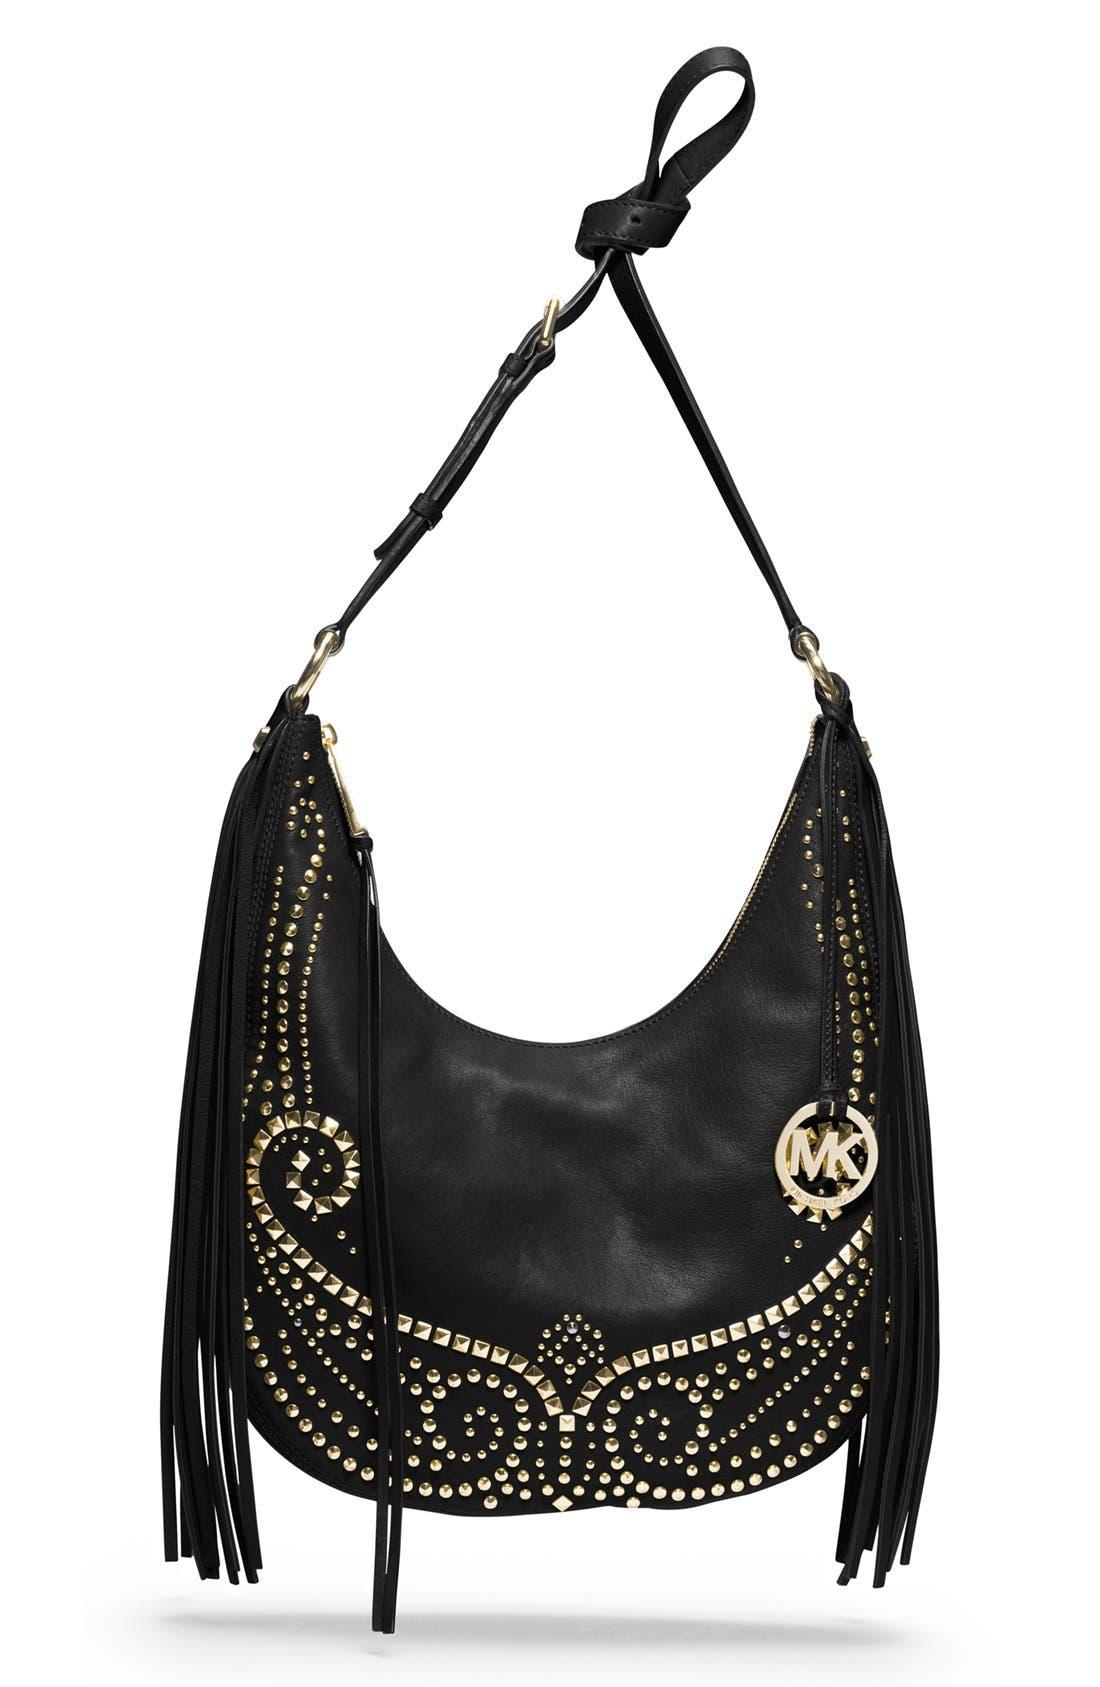 Alternate Image 1 Selected - MICHAEL Michael Kors 'Rhea' Studded Leather Shoulder Bag